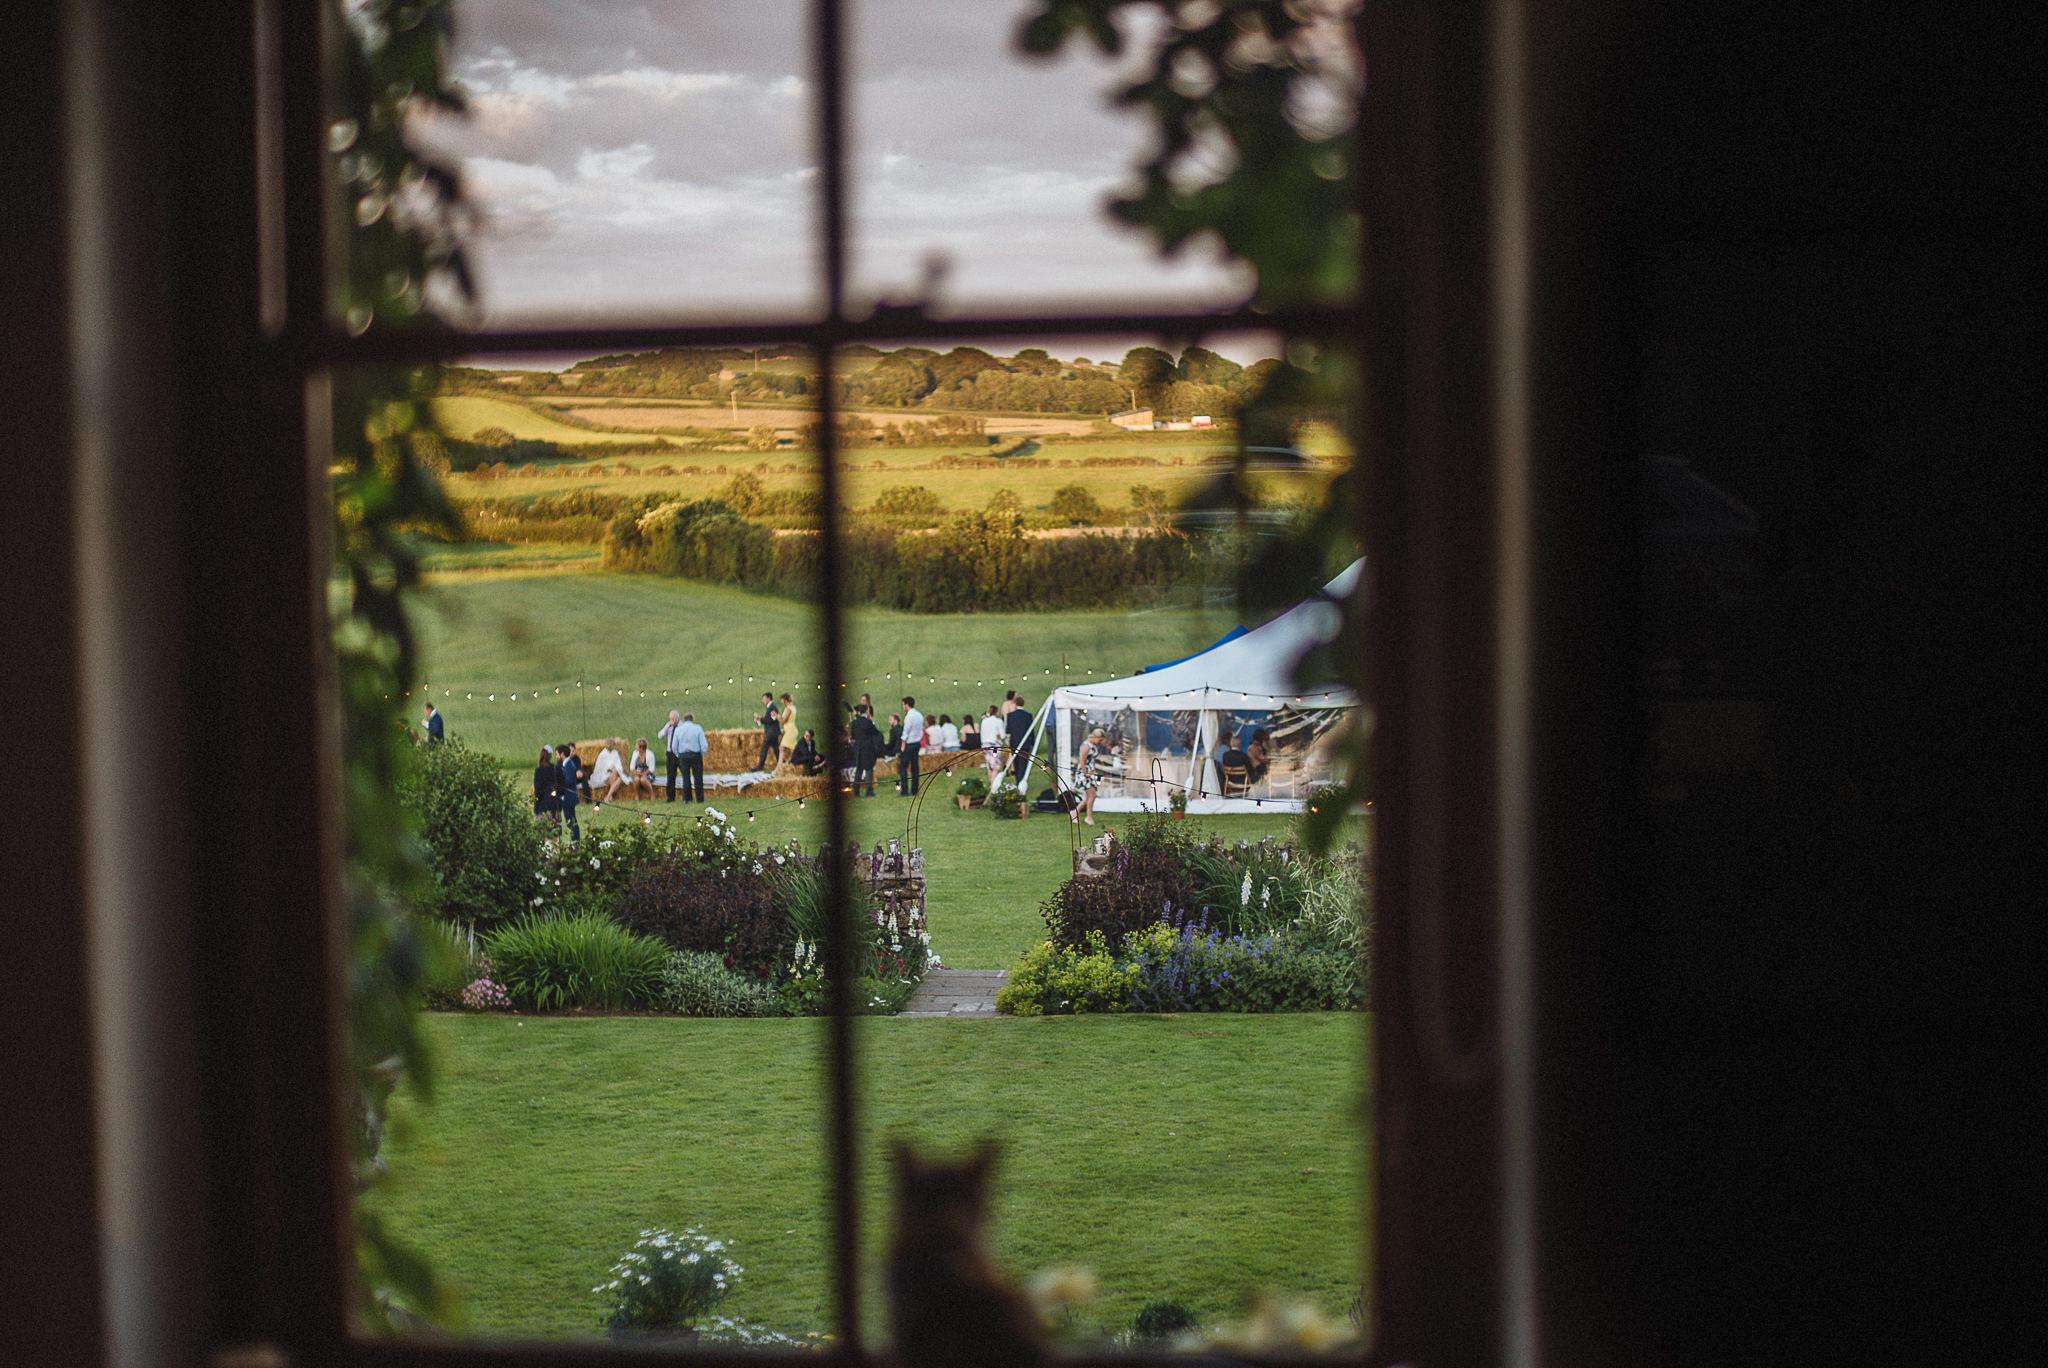 paul-marbrook-Farm-Wedding-Photographer-Lancashire-90084